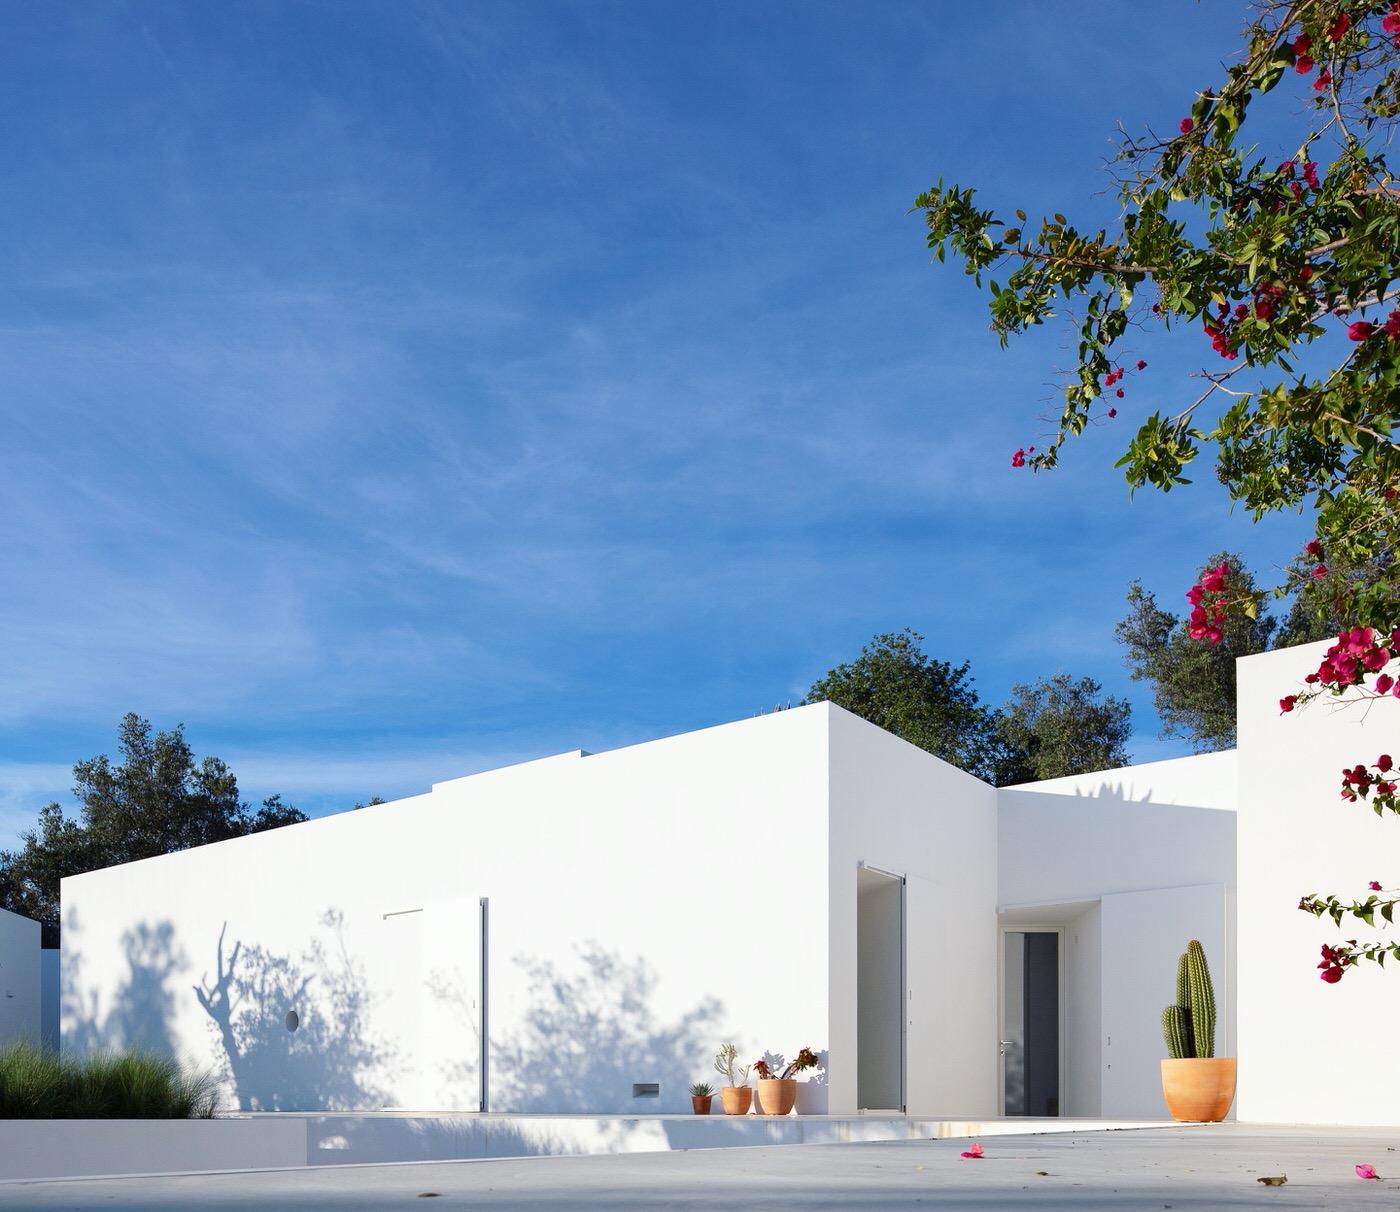 Zalig-Algarve-Casa-Luum-179-1